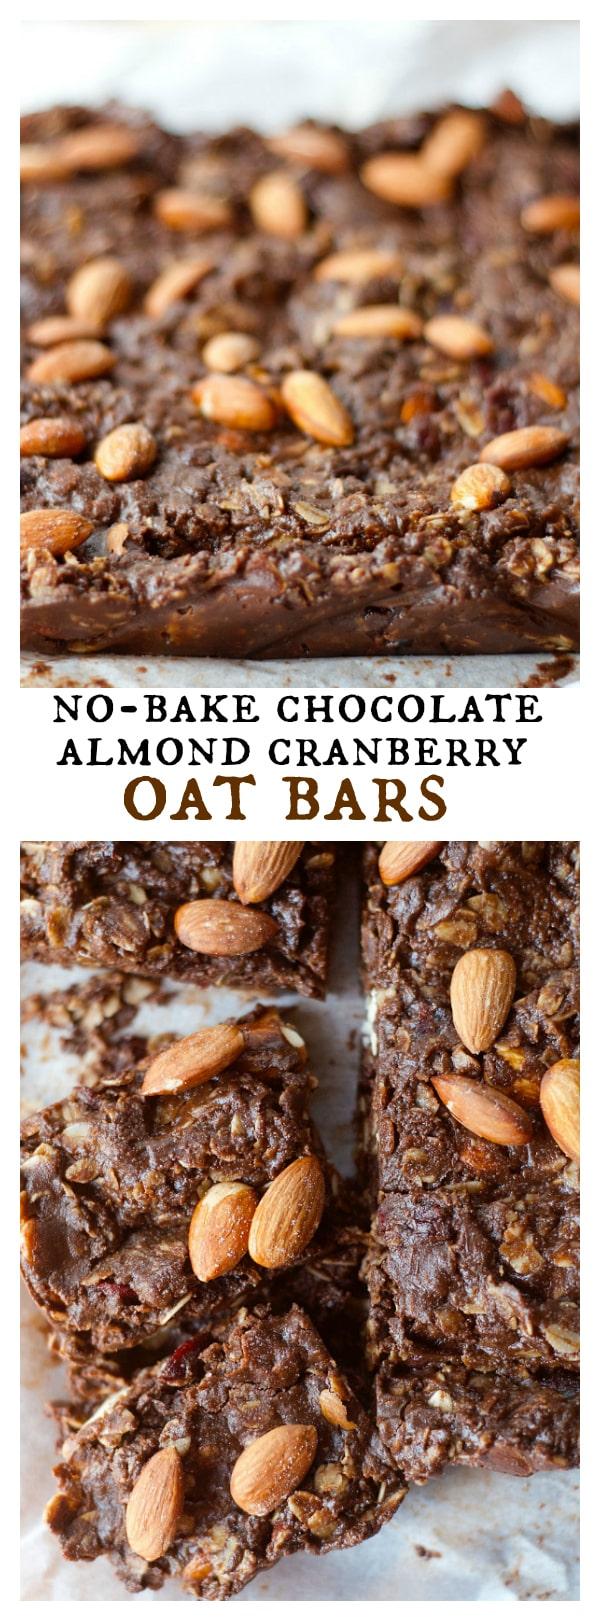 NO-Bake Chocolate Almond Cranberry Oat Bars